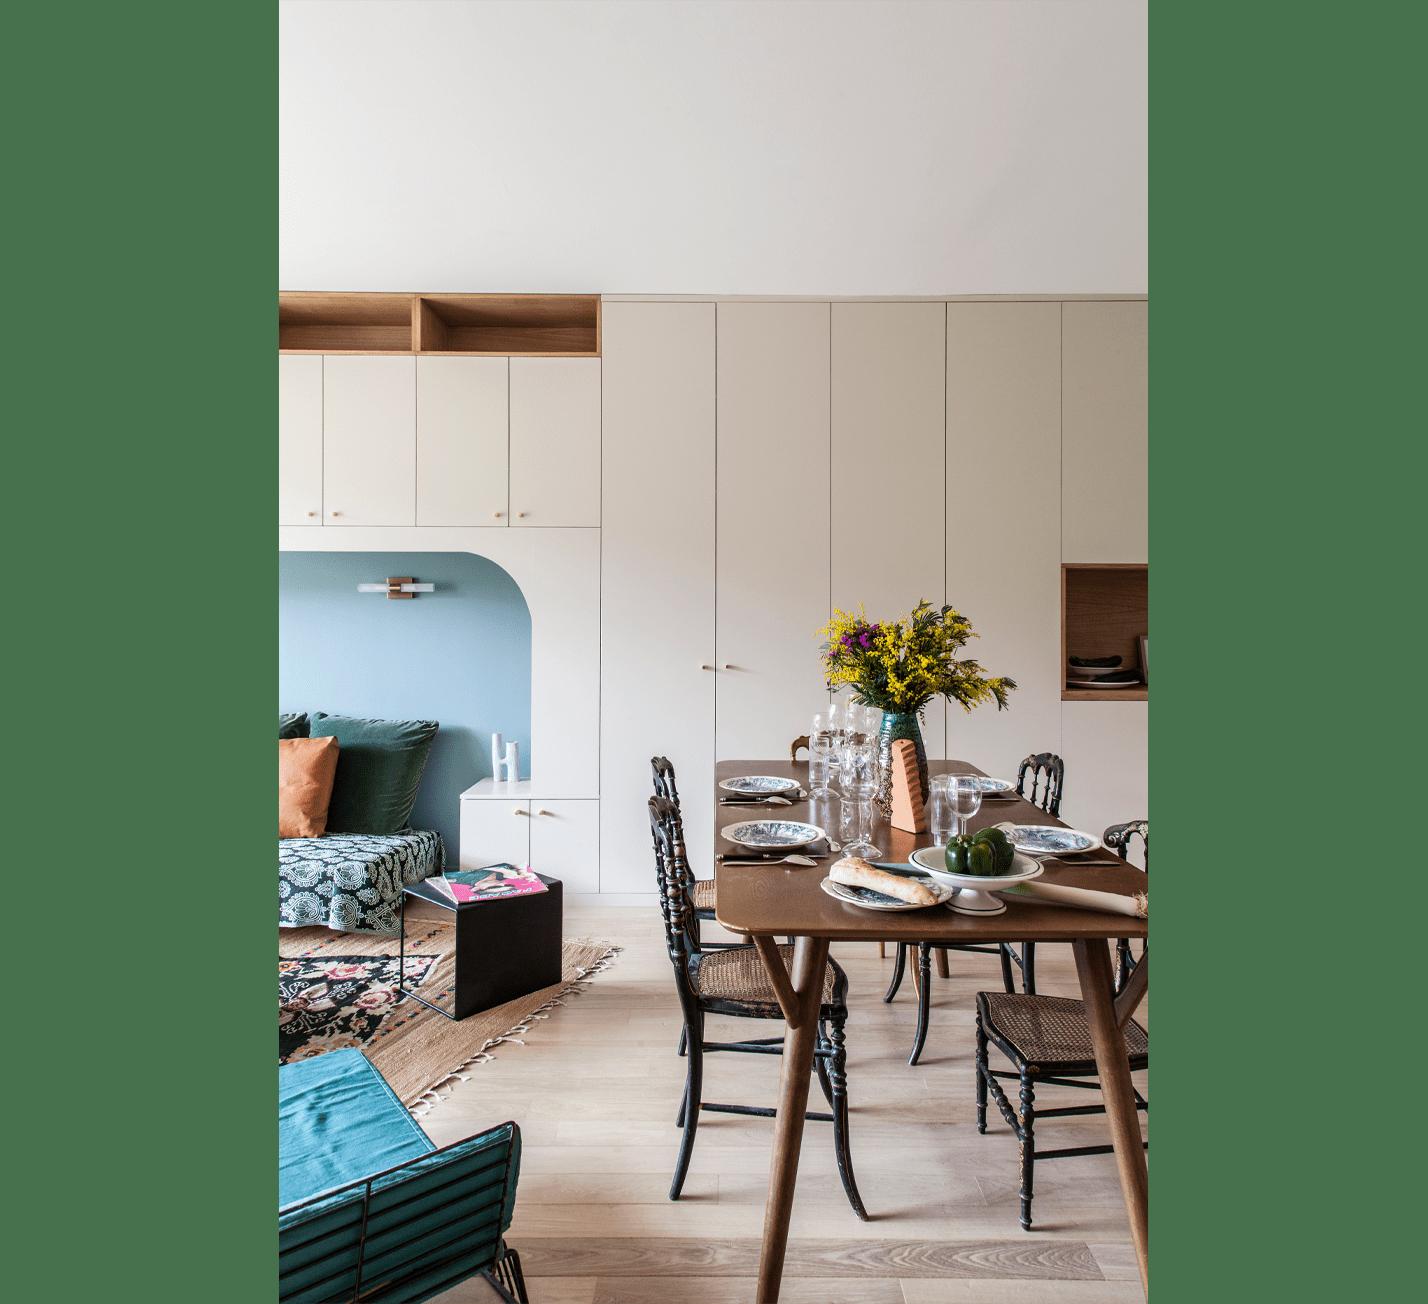 Projet-Albert-Atelier-Steve-Pauline-Borgia-Architecte-interieur-02-min-1